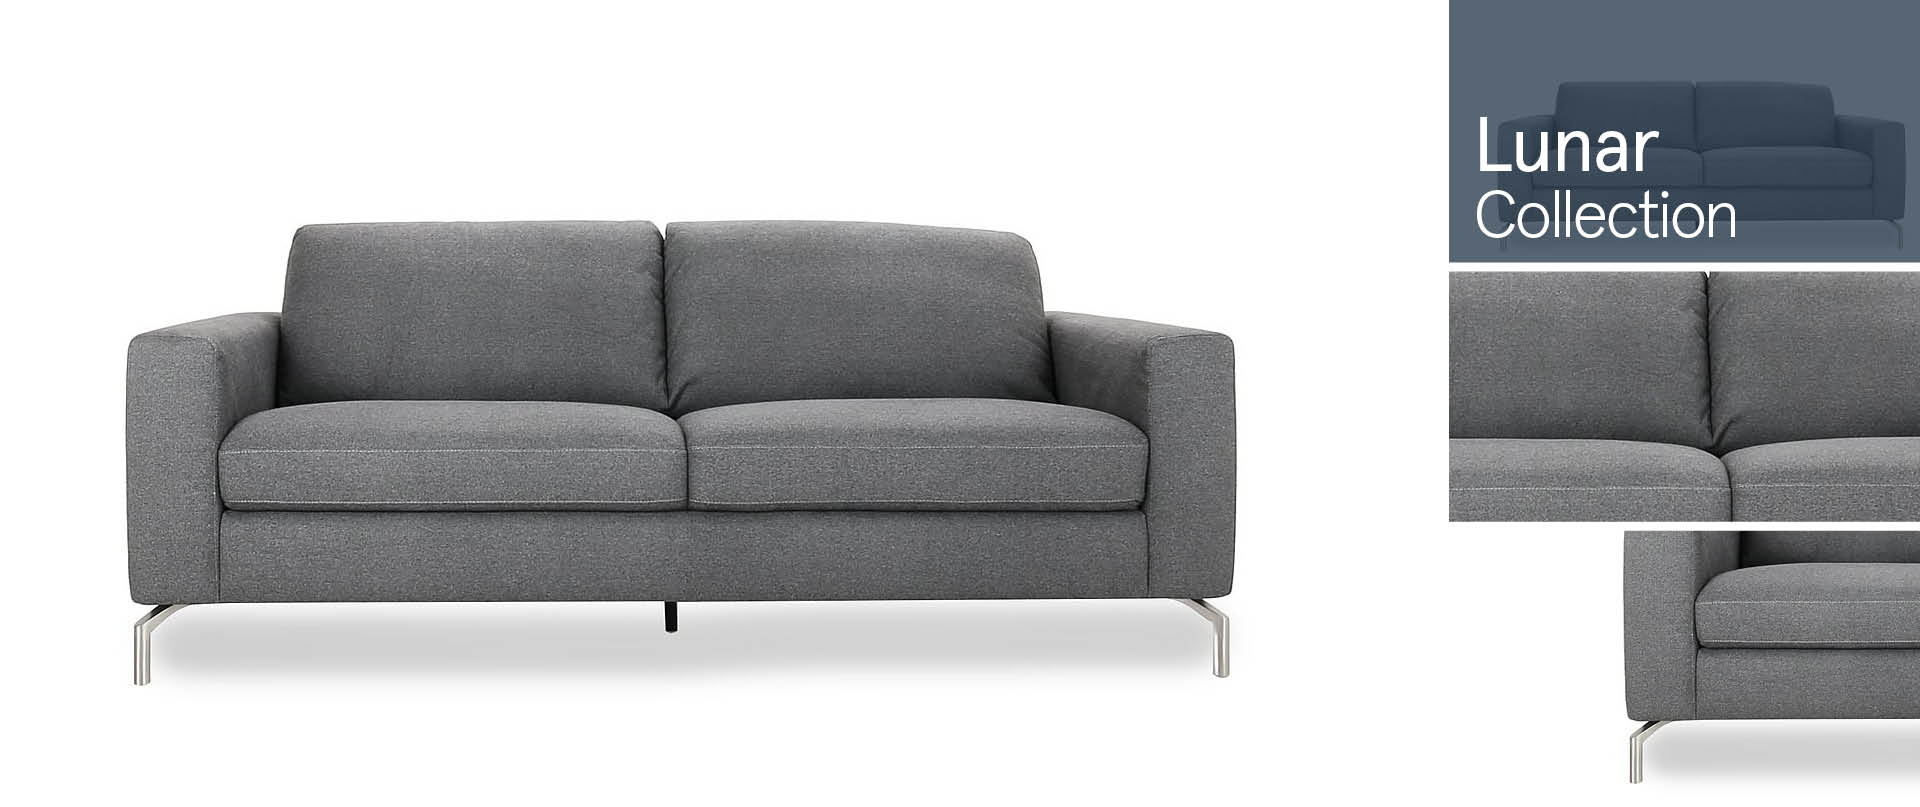 Lunar All Fabric Sofa Ranges